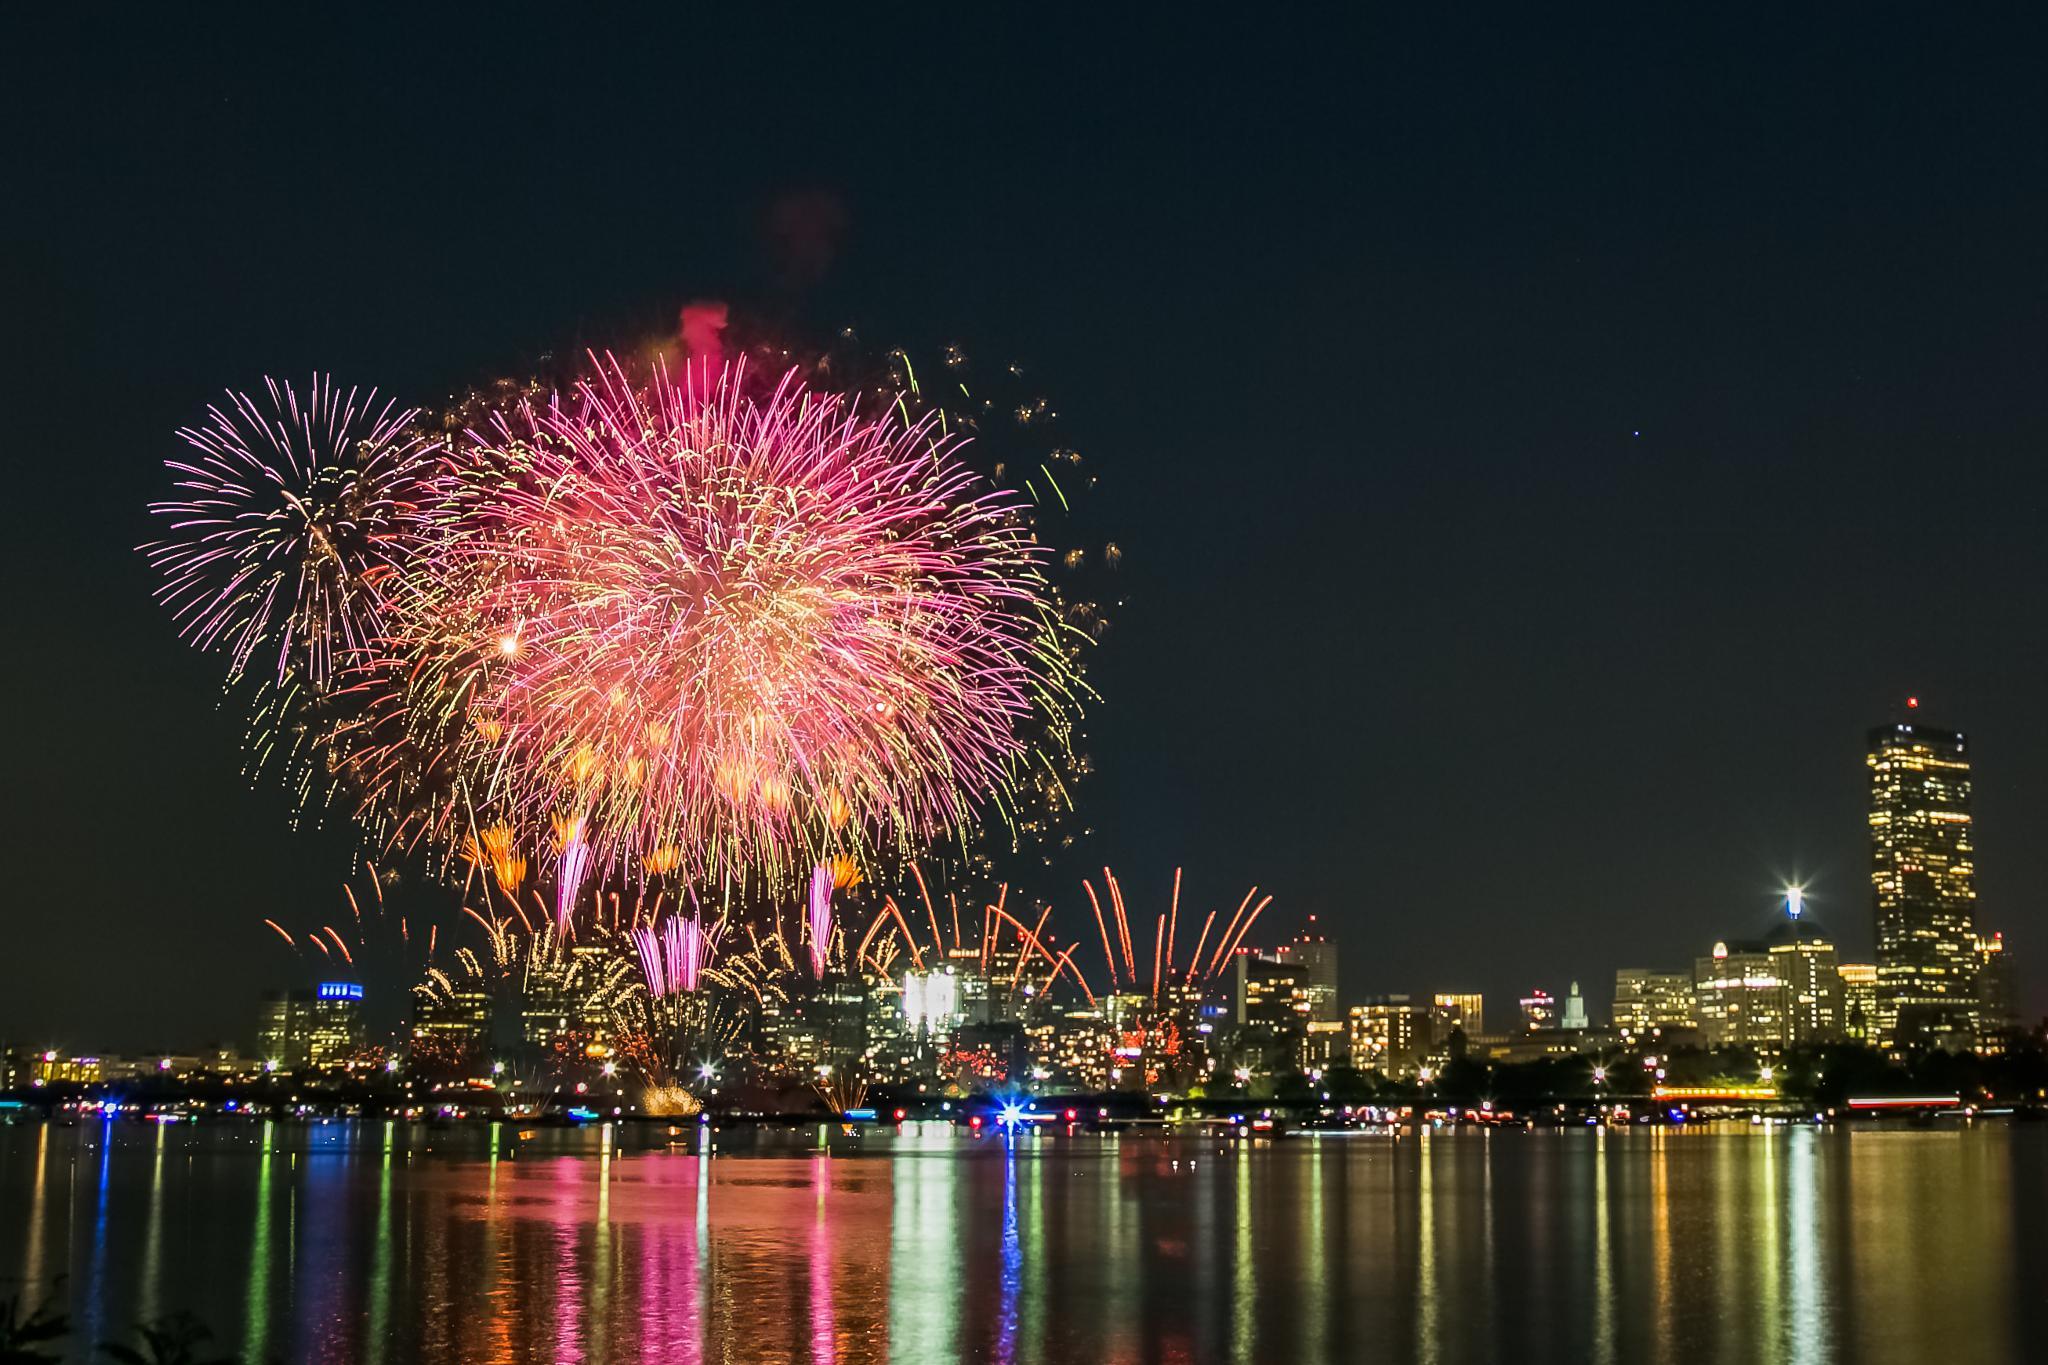 July 4 fireworks by Cary Chu